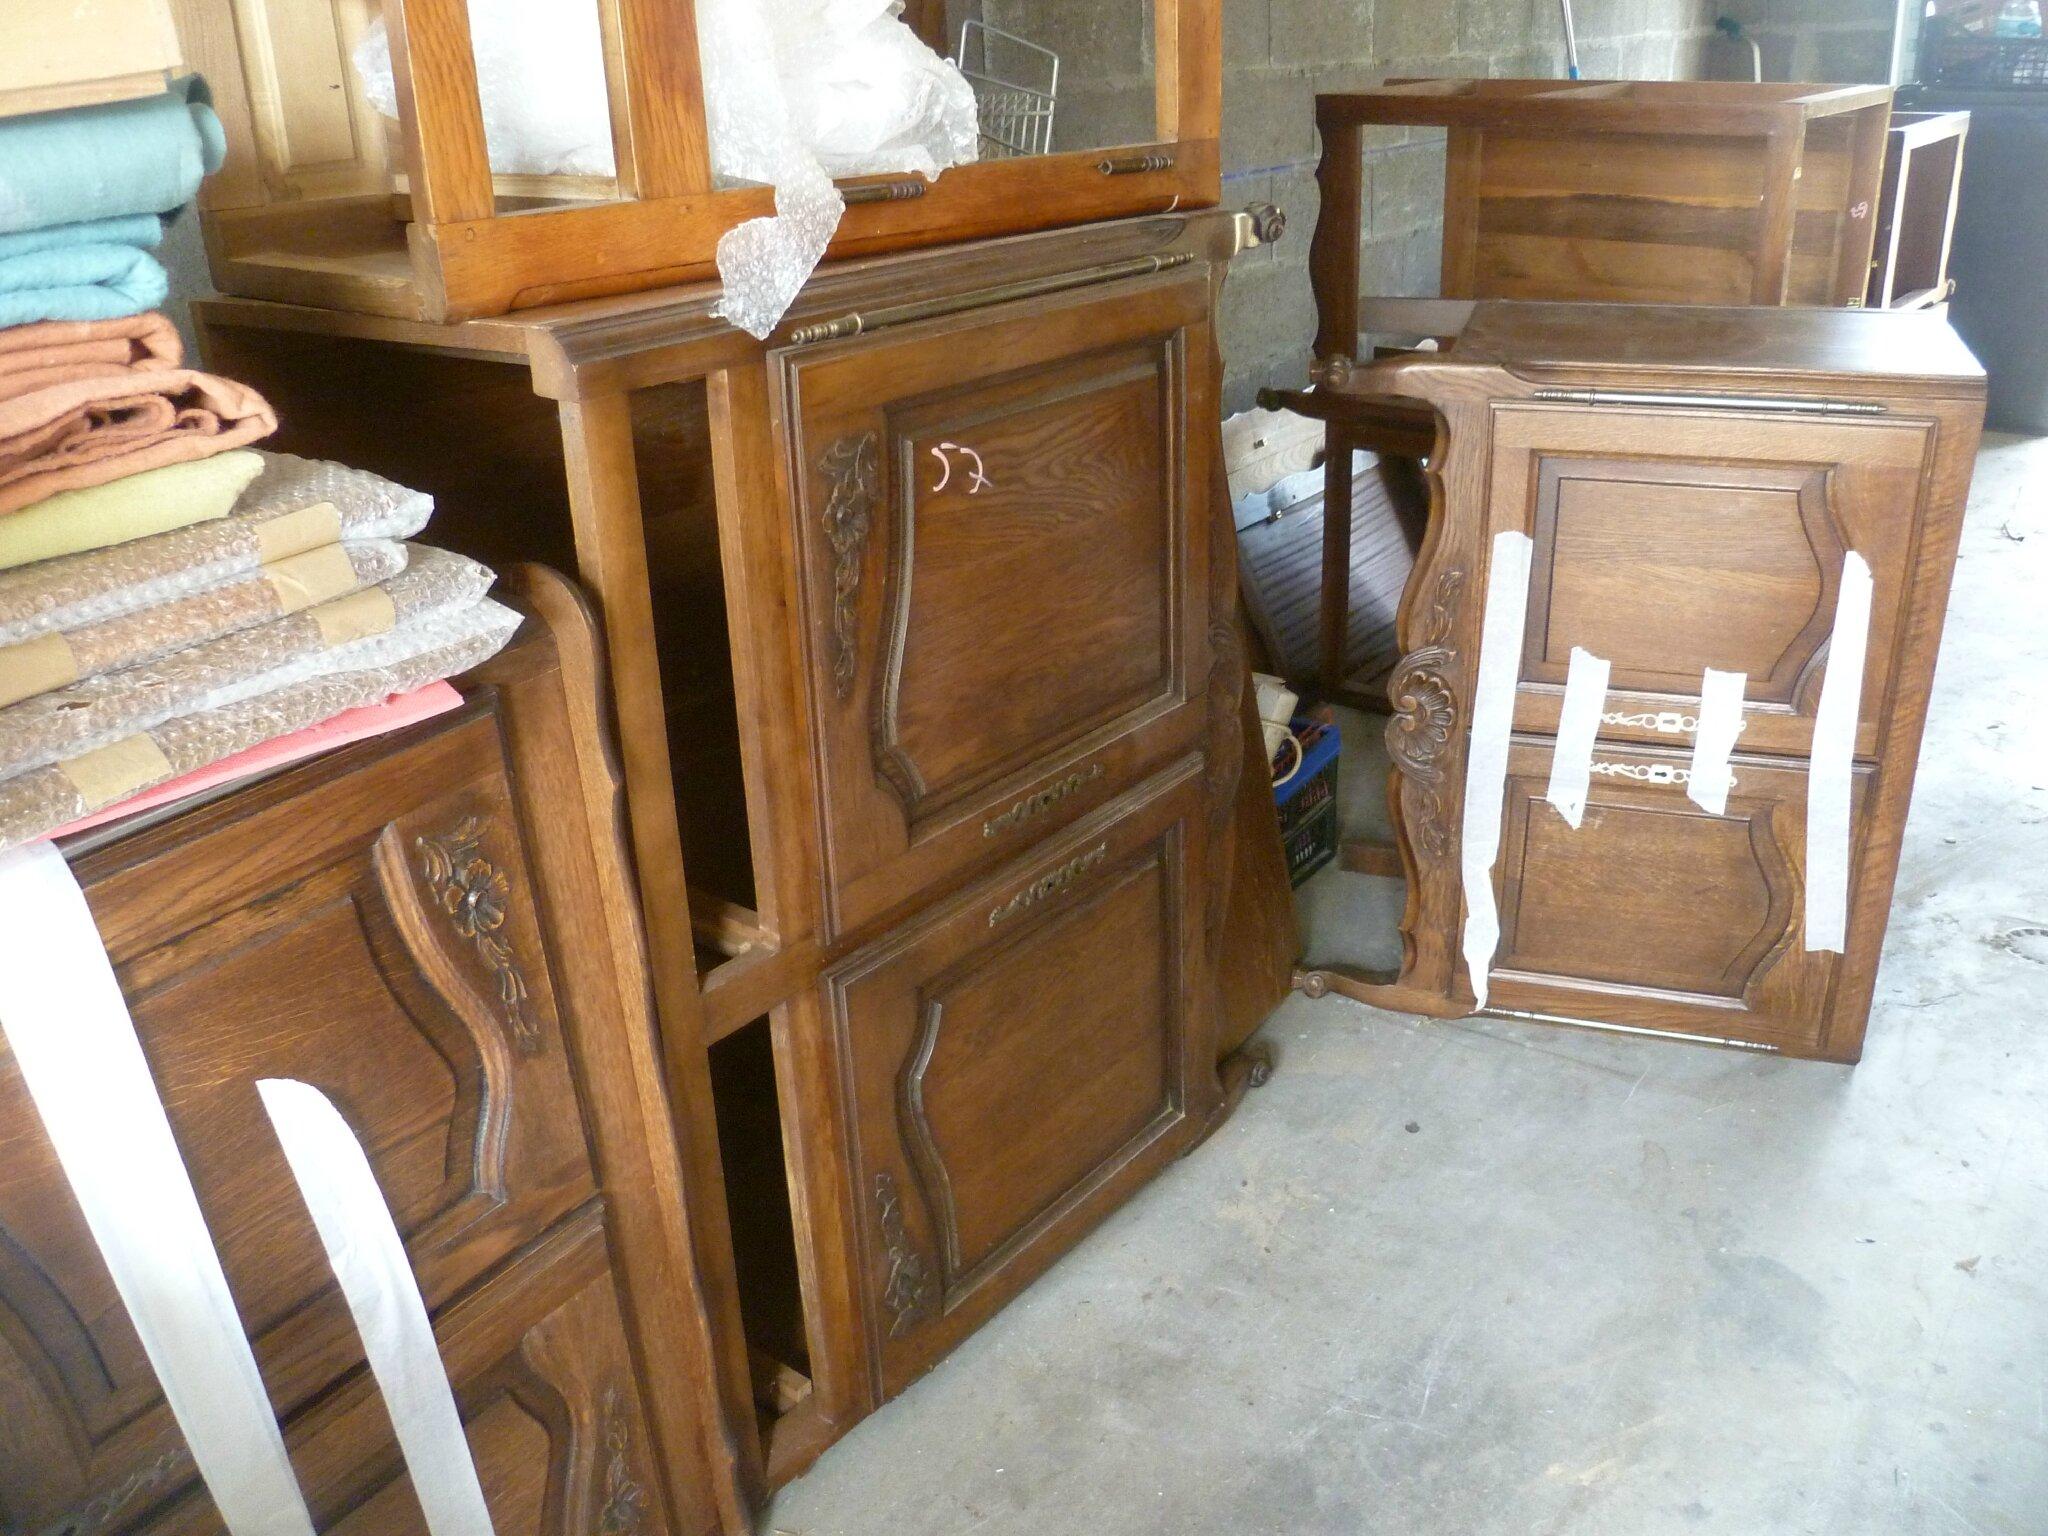 patiner c ruser d caper un meuble bois ancien buffet. Black Bedroom Furniture Sets. Home Design Ideas